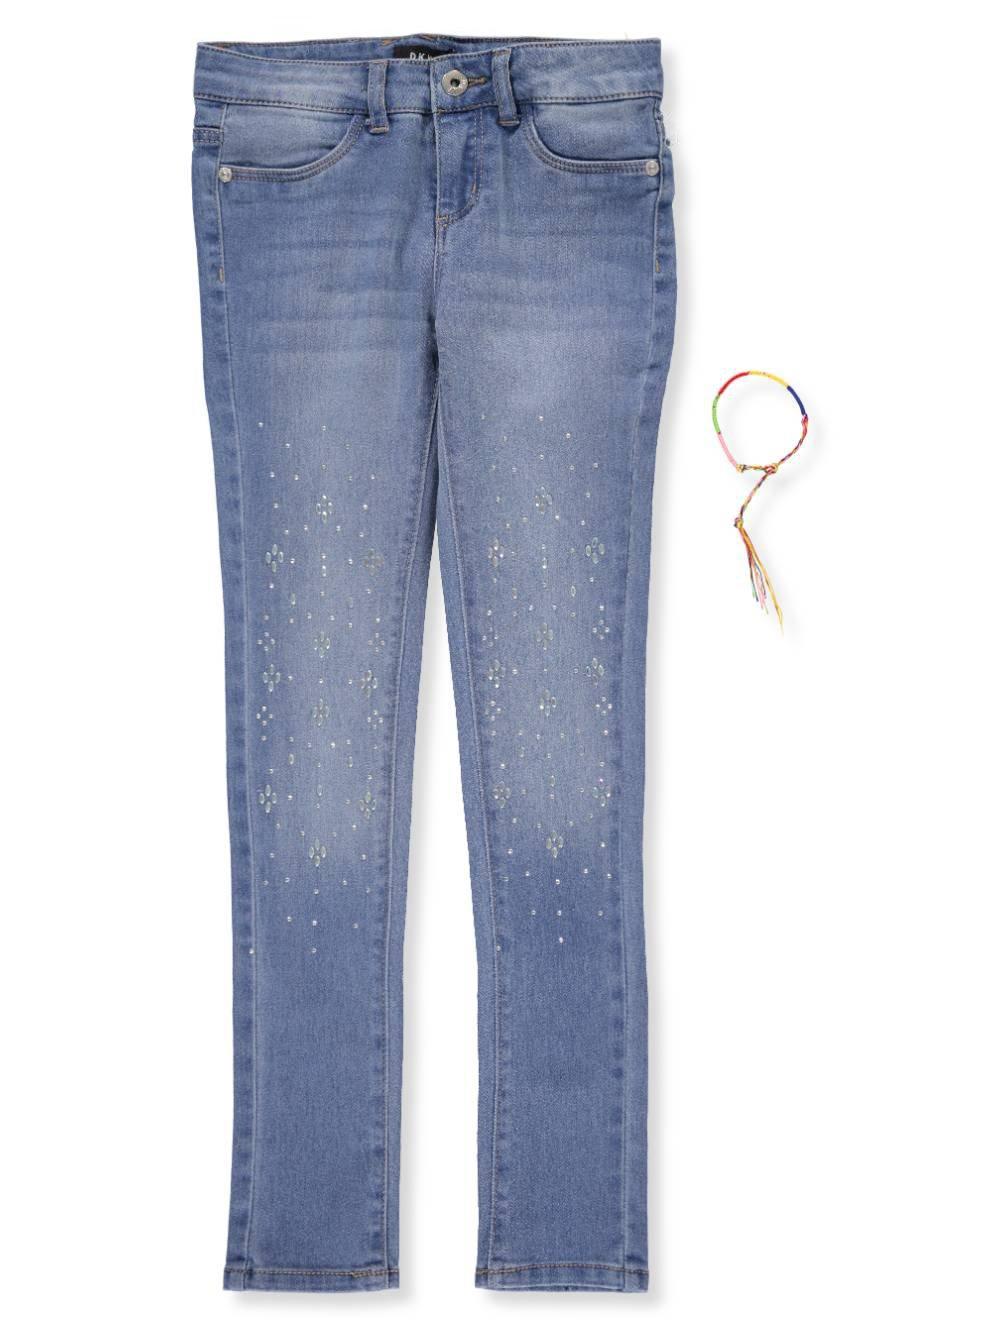 DKNY Big Girls' Full Length Stone Skinny Jean, Blue Jay, 14